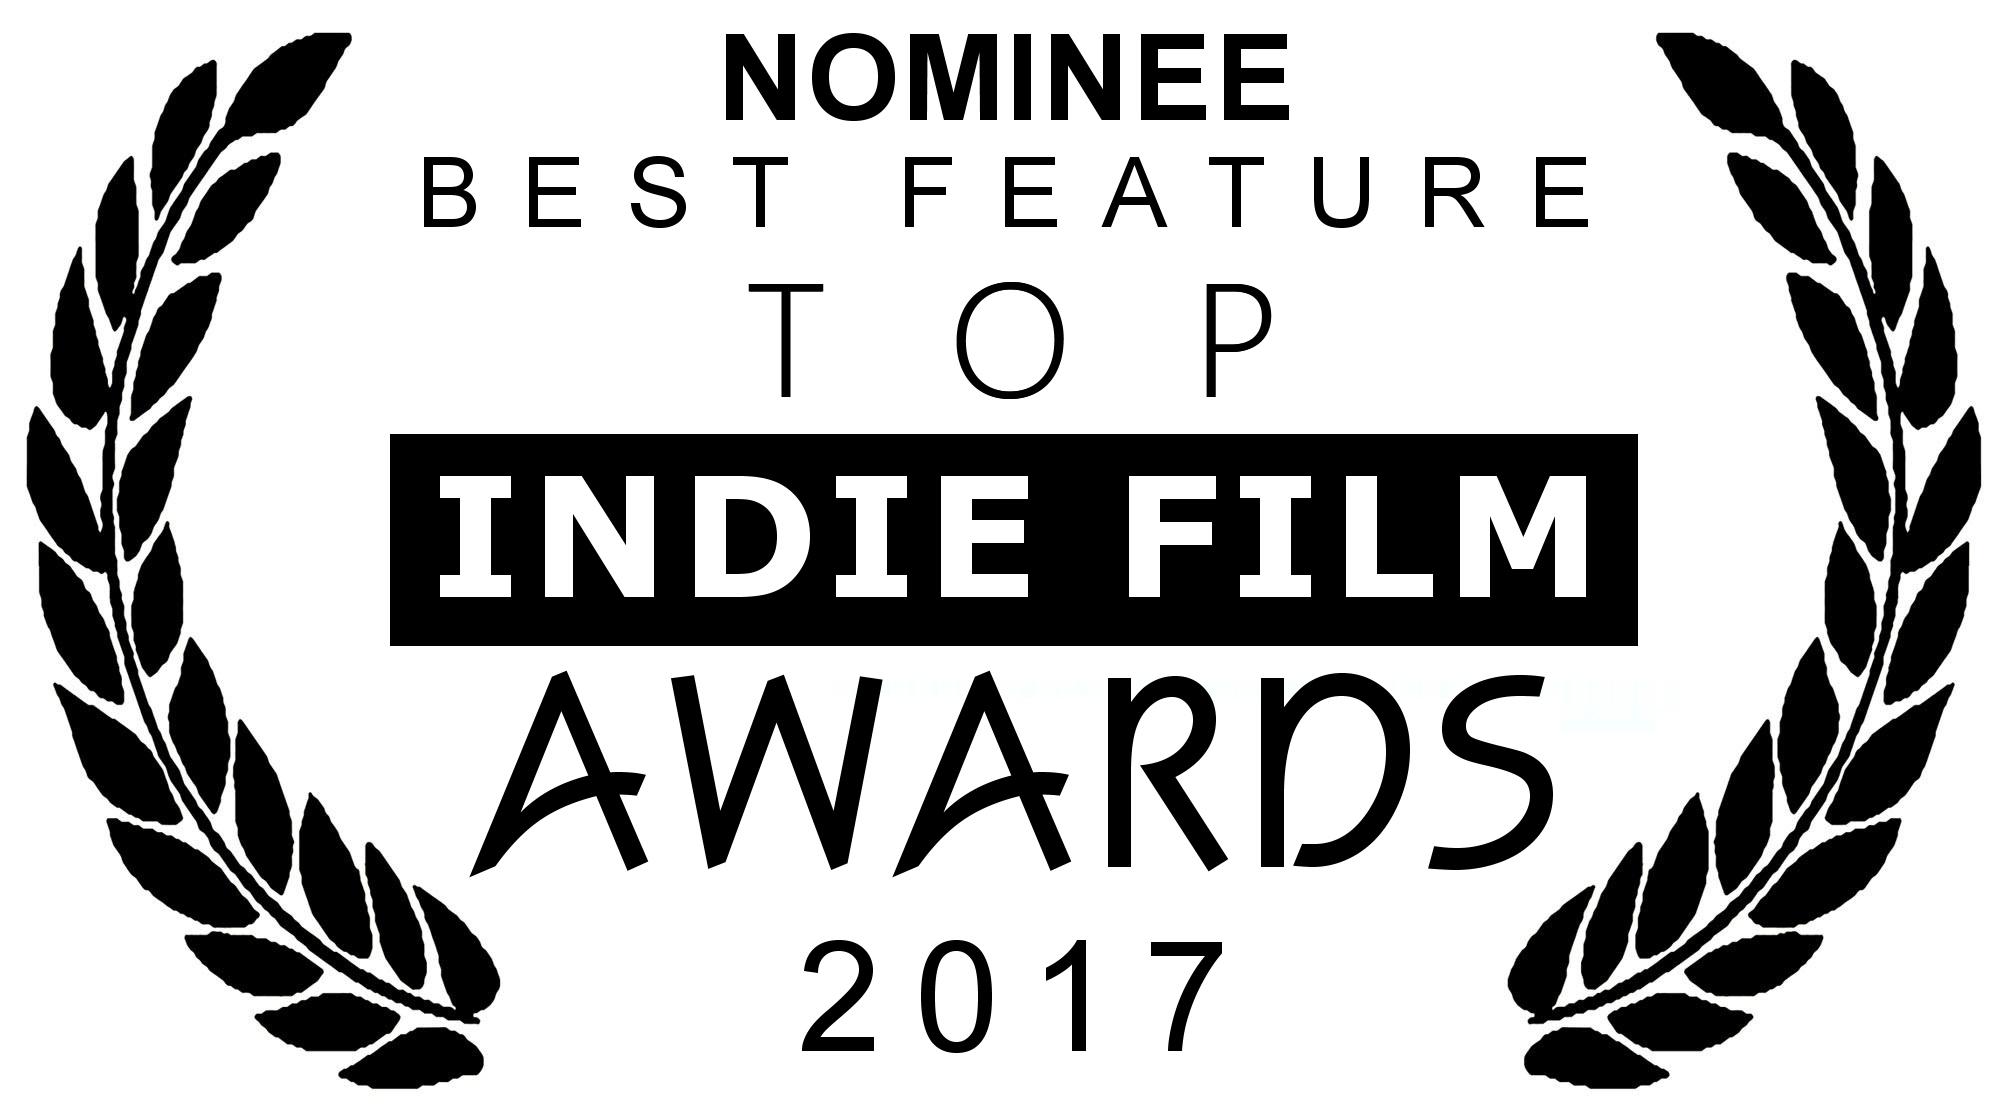 tifa-2017-nominee-best-feature.jpg